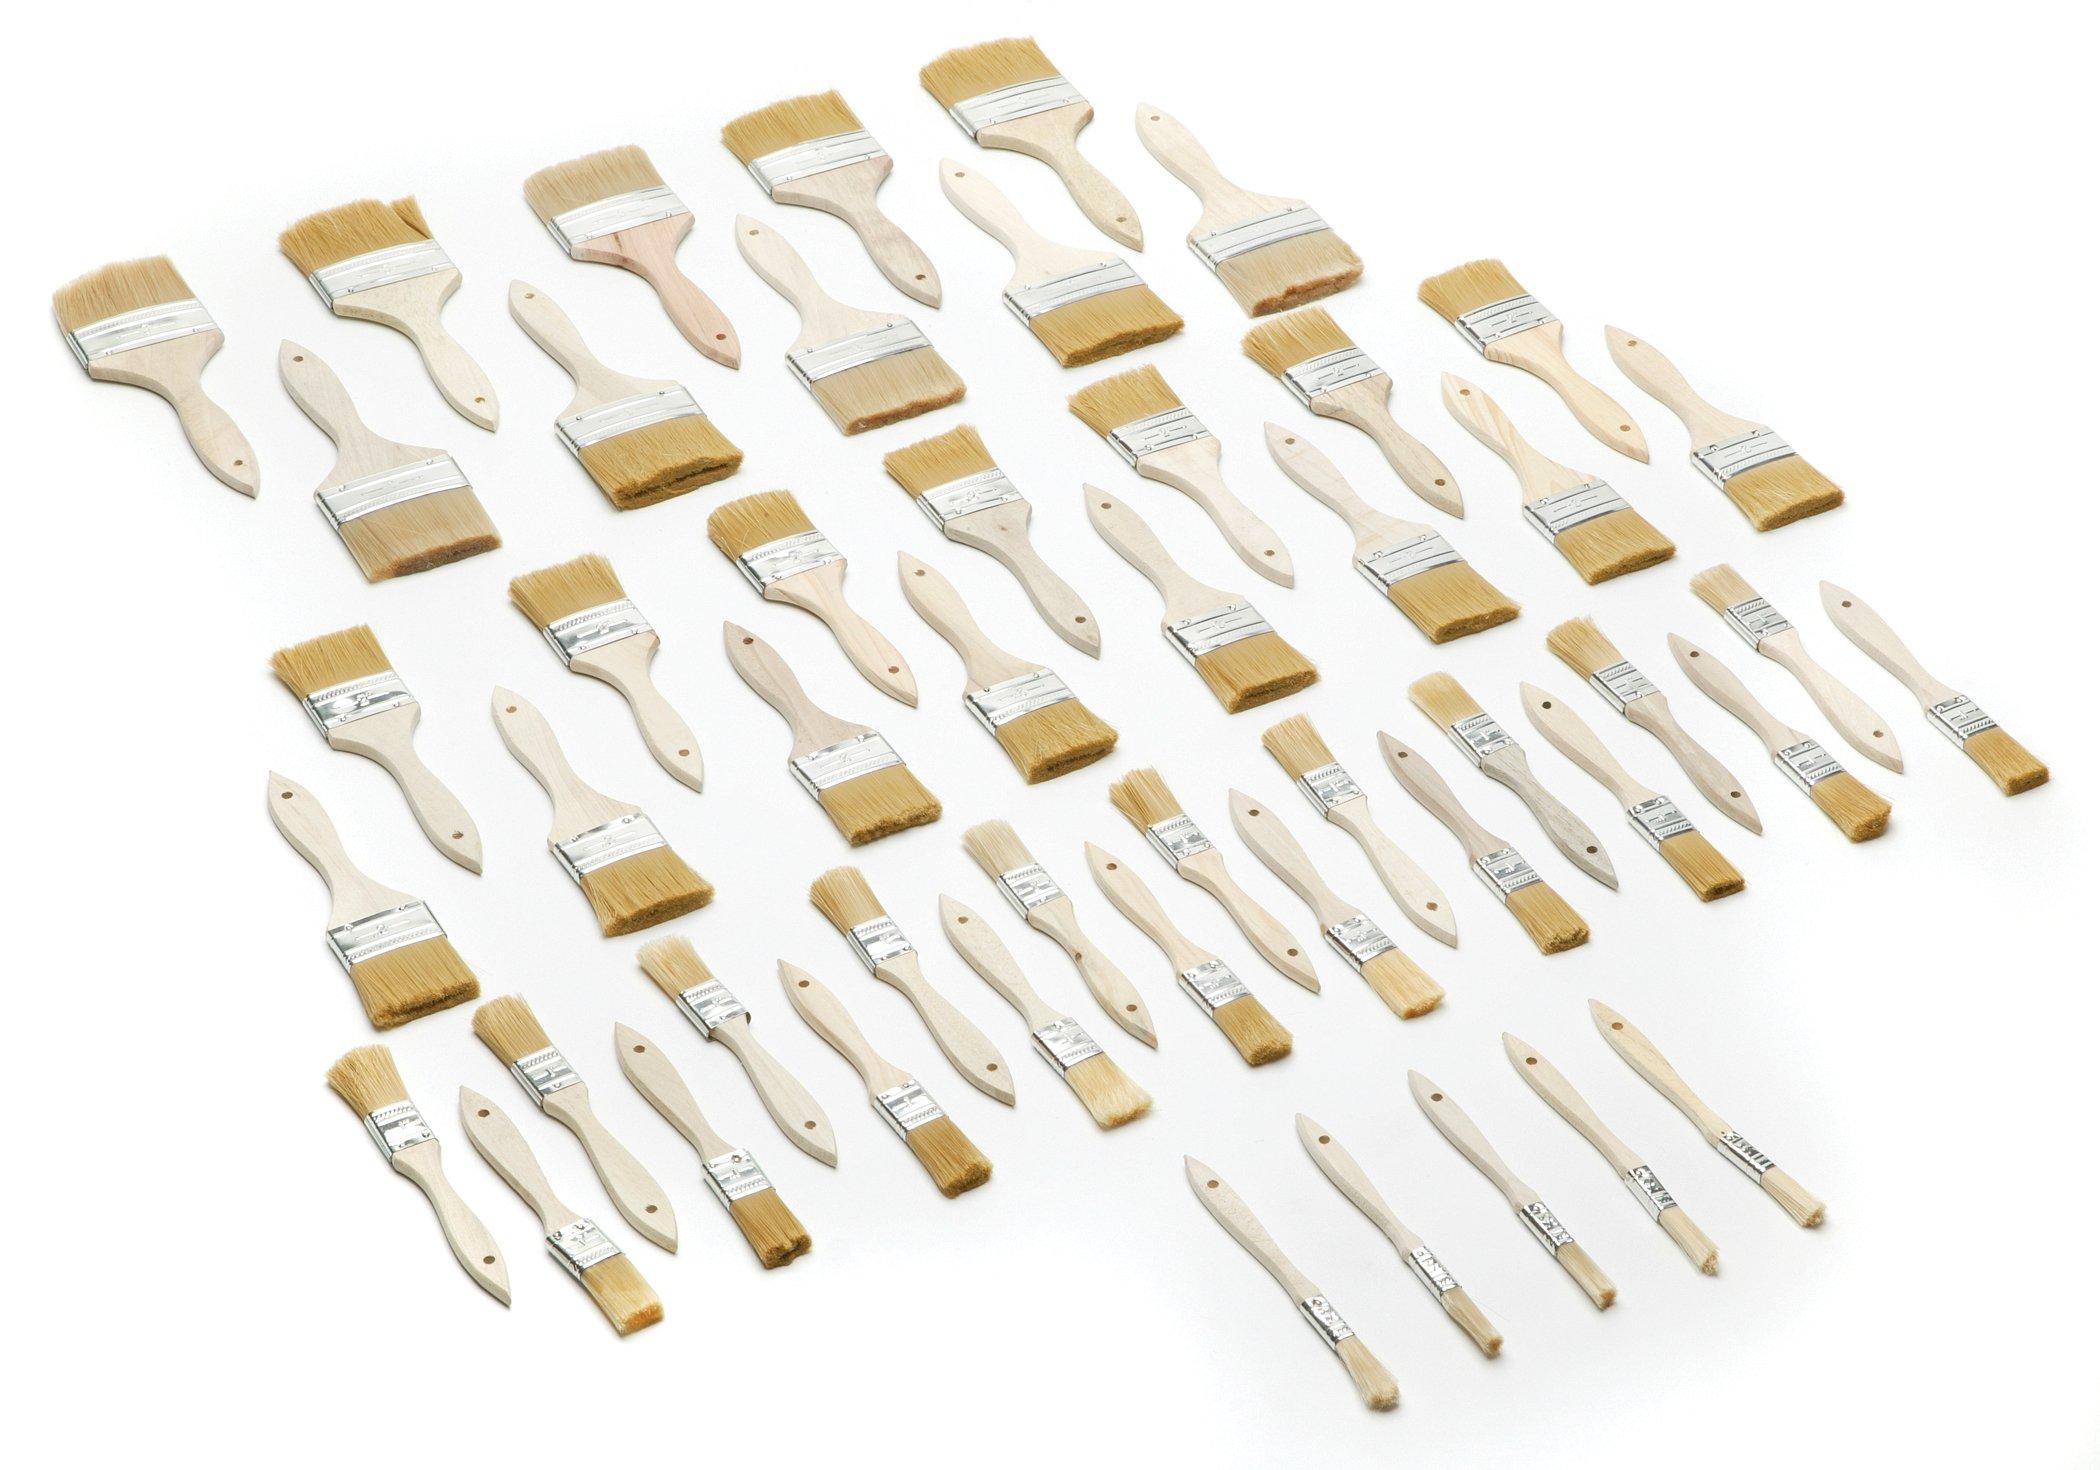 Woodstock D2025 Synthetic Bristle Brush Set, 50-Piece